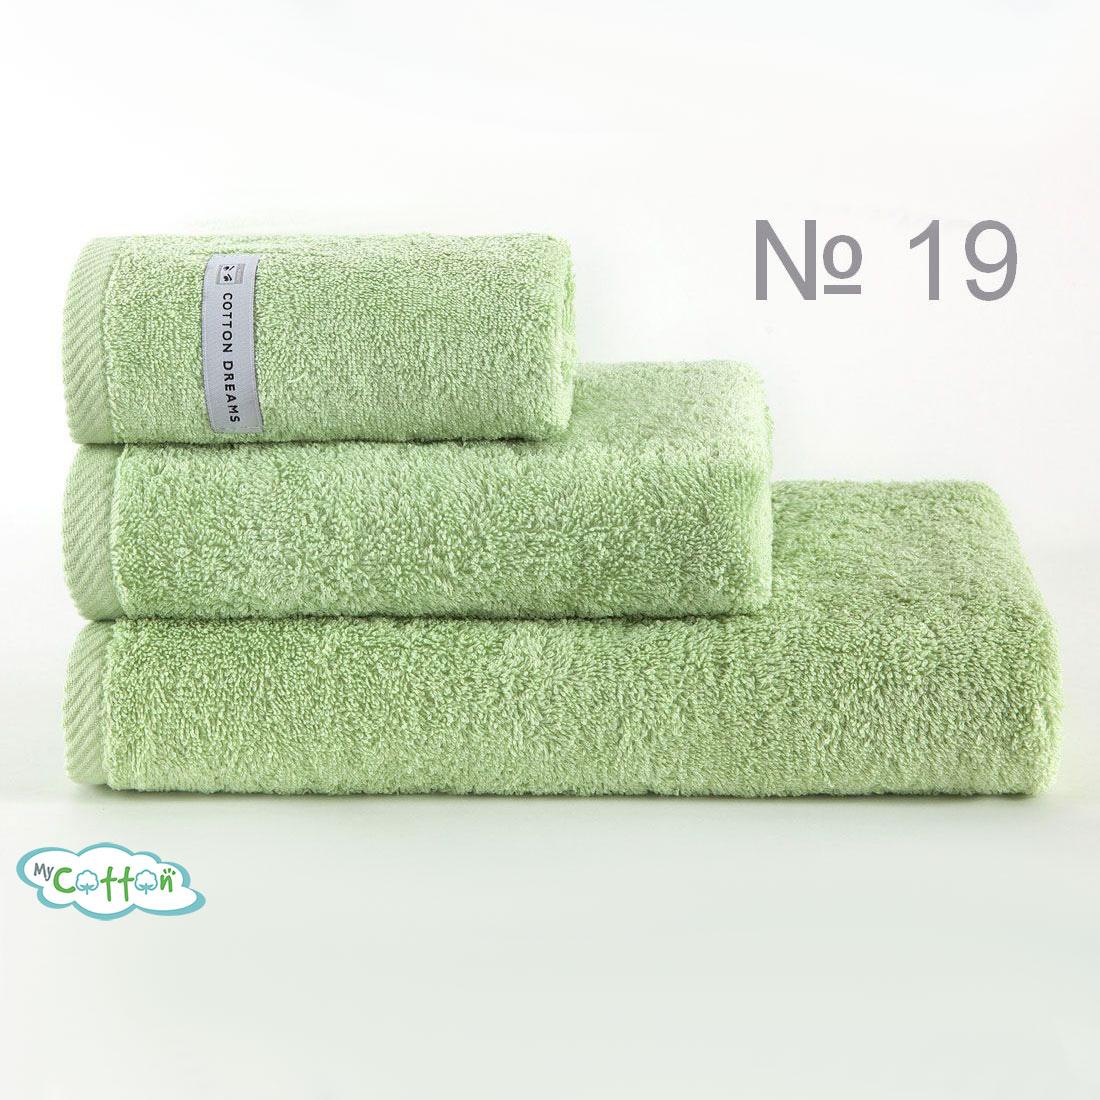 Полотенце BOURGEOIS NOUVEAU GREEN FIELD №19